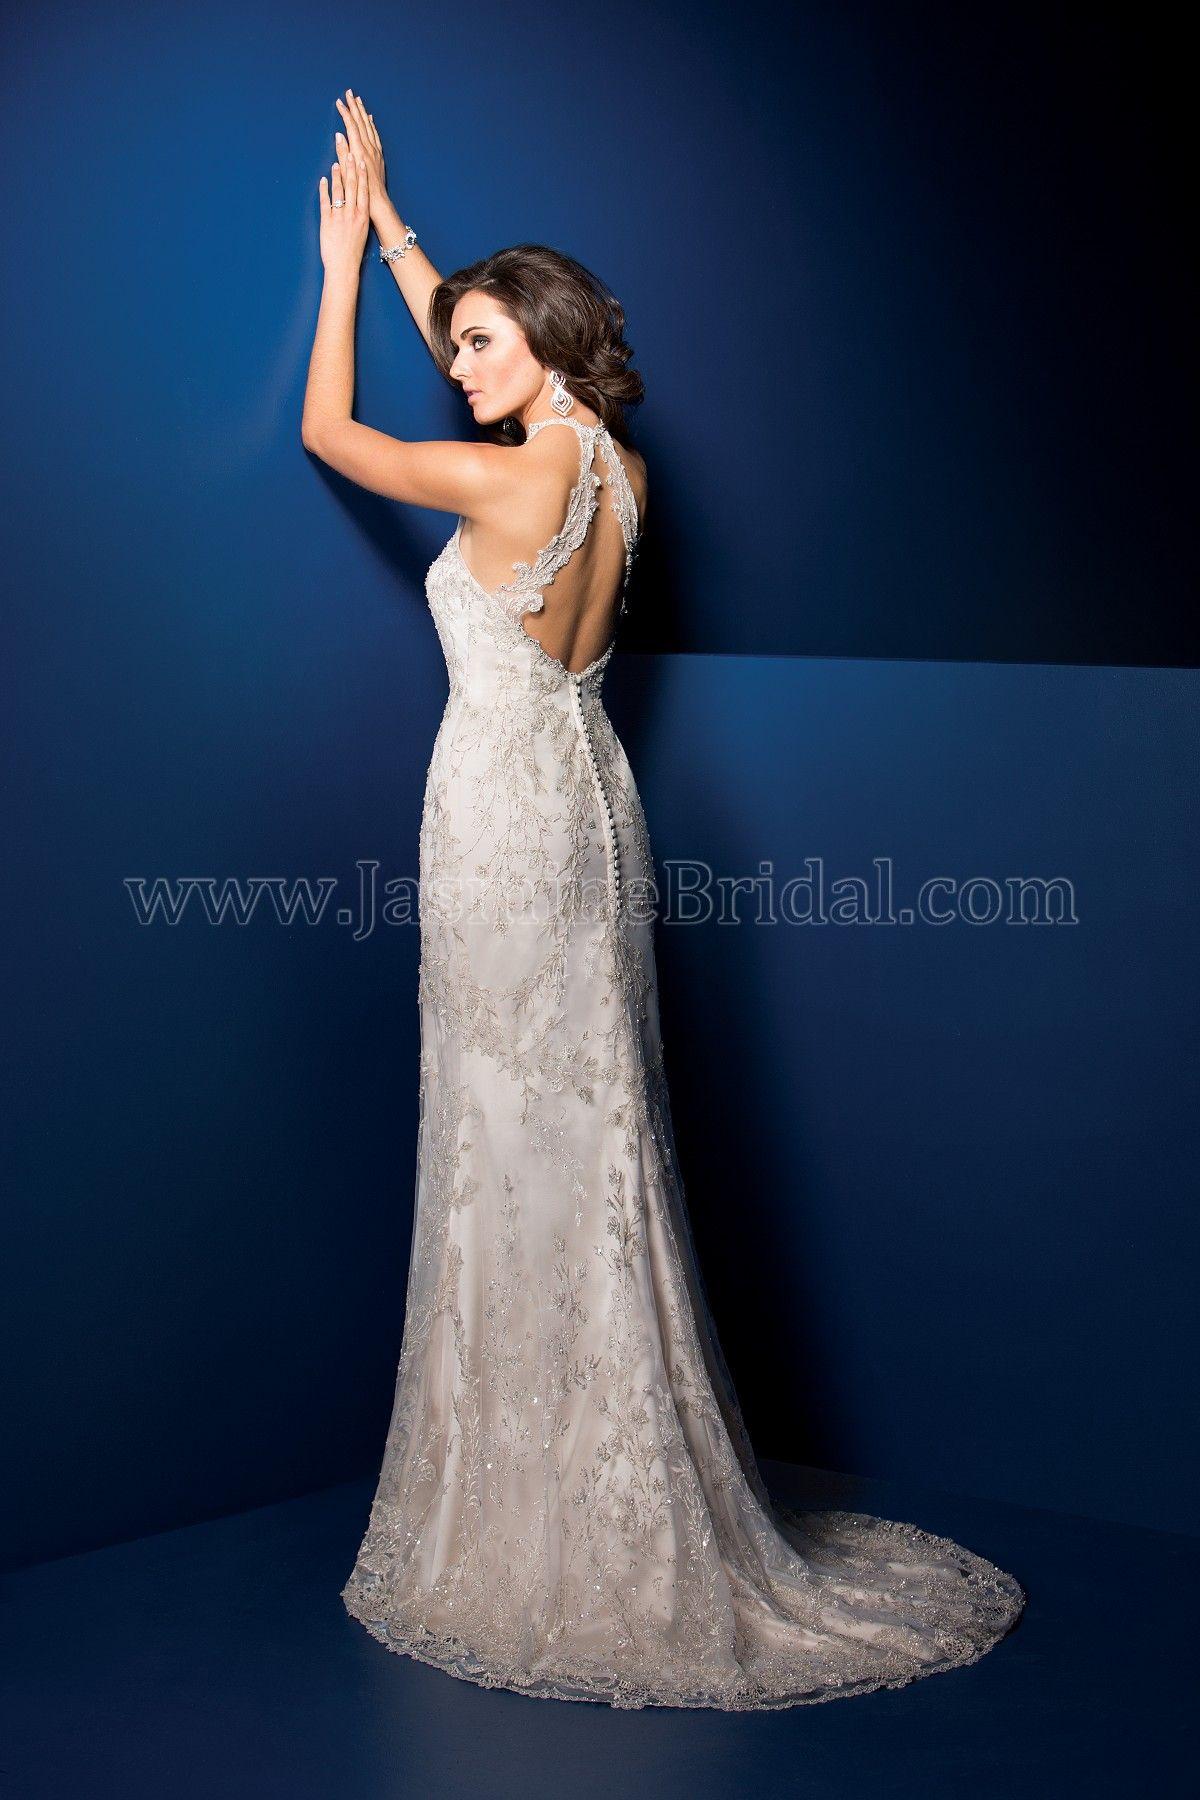 Plus size wedding reception dresses for guests  Jasmine Bridal  Designer Wedding Dresses  Wedding Day Bride Stuff